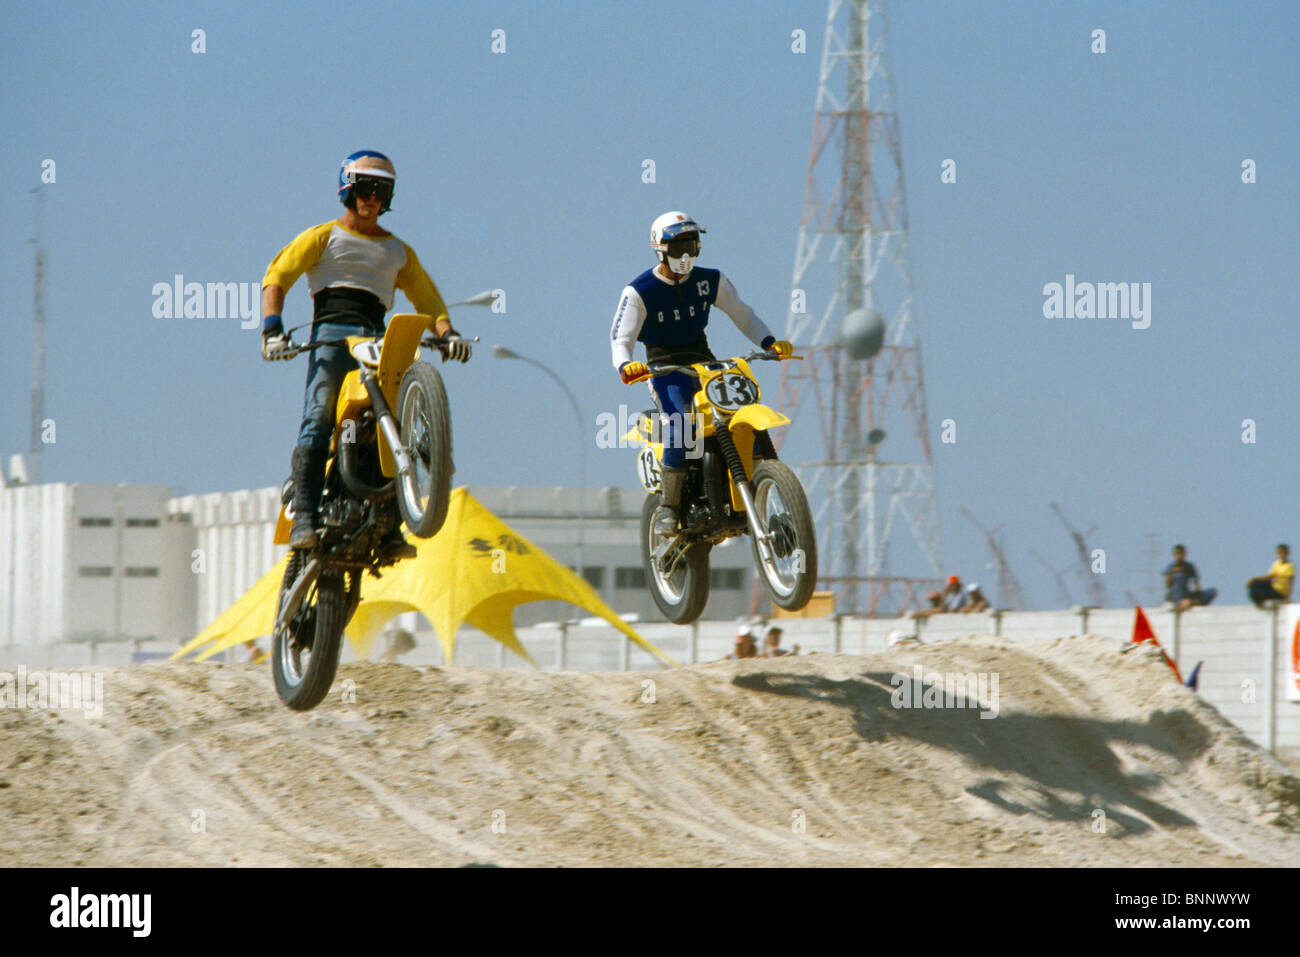 Dubai-Vereinigte Arabische Emirate-Motorrad kriechen, Stockbild